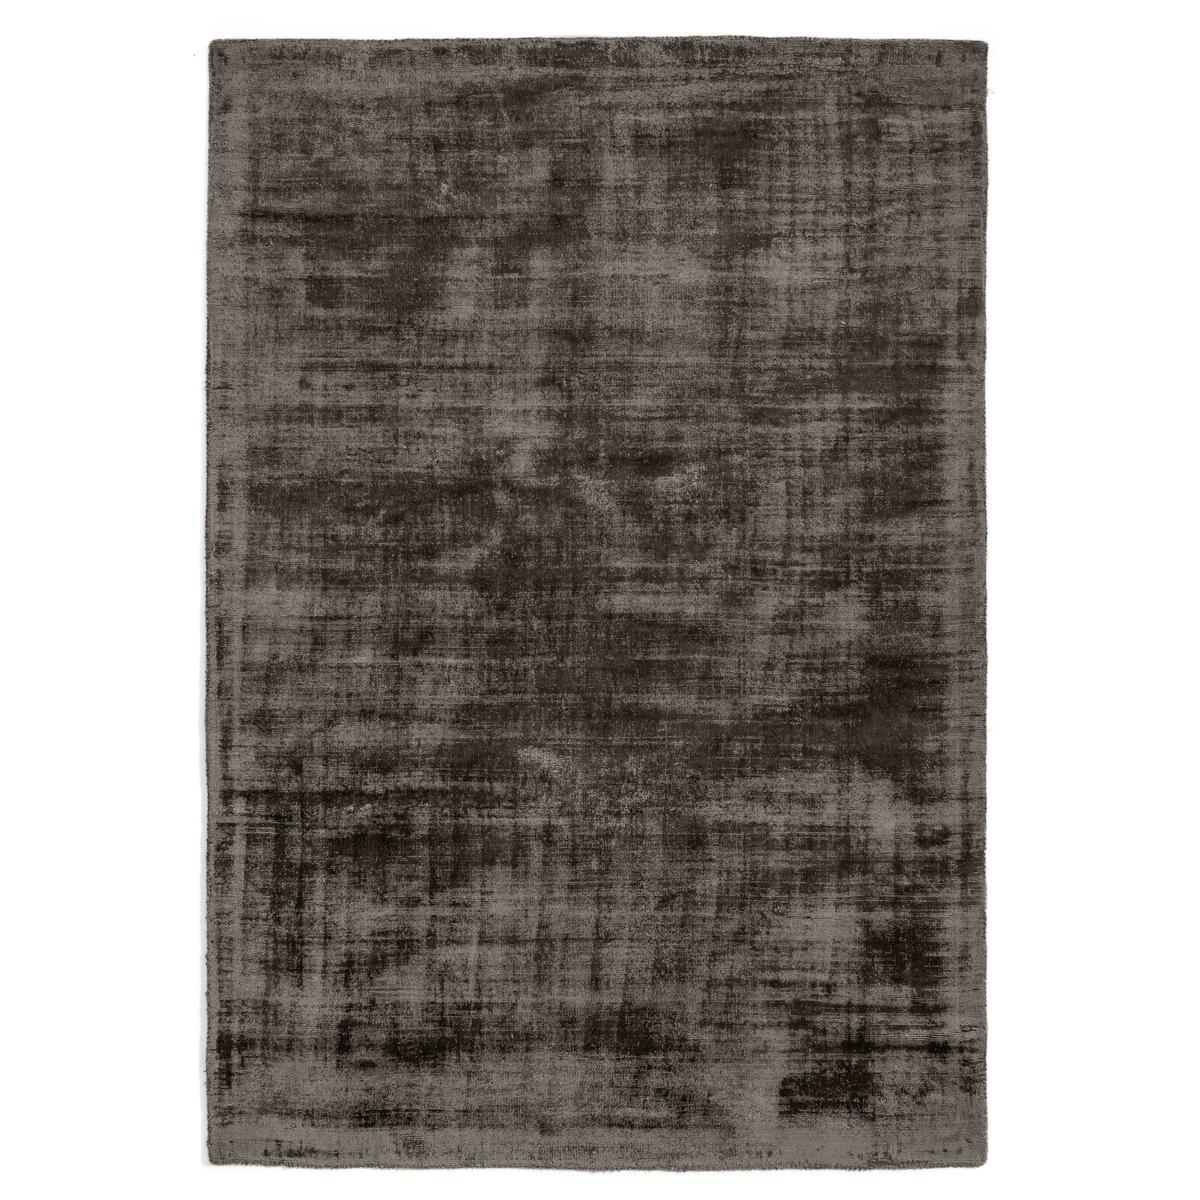 Ковр La Redoute С коротким ворсом 120 x 180 см серый ковер la redoute горизонтального плетения с рисунком цементная плитка iswik 120 x 170 см бежевый